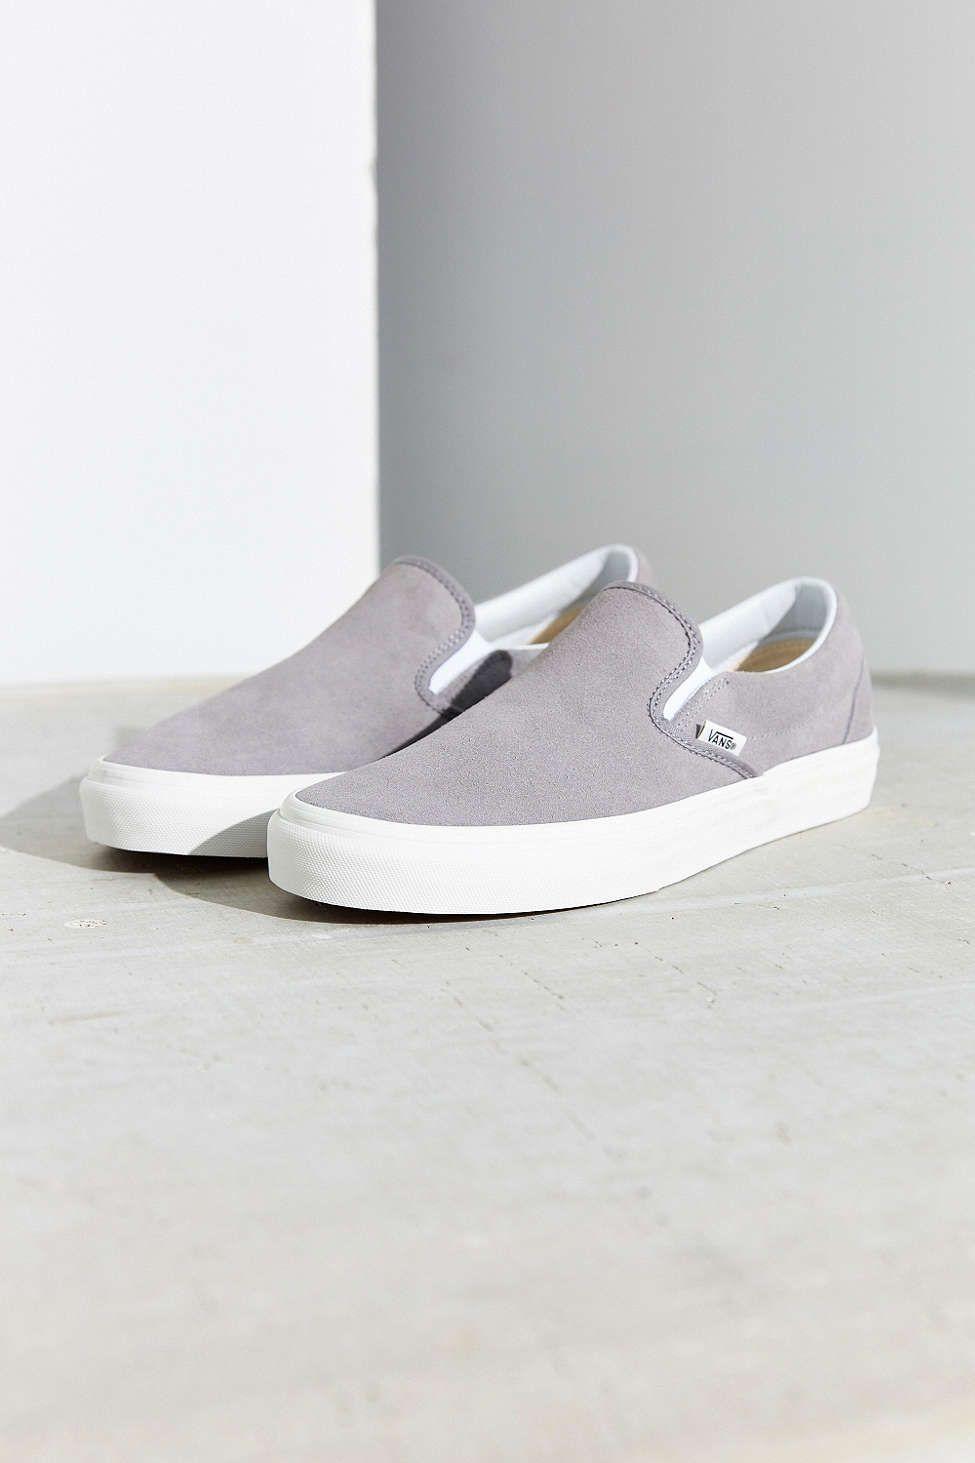 be66c38f13 Vans Vintage Classic Slip-On Sneaker  UrbanOutfitters